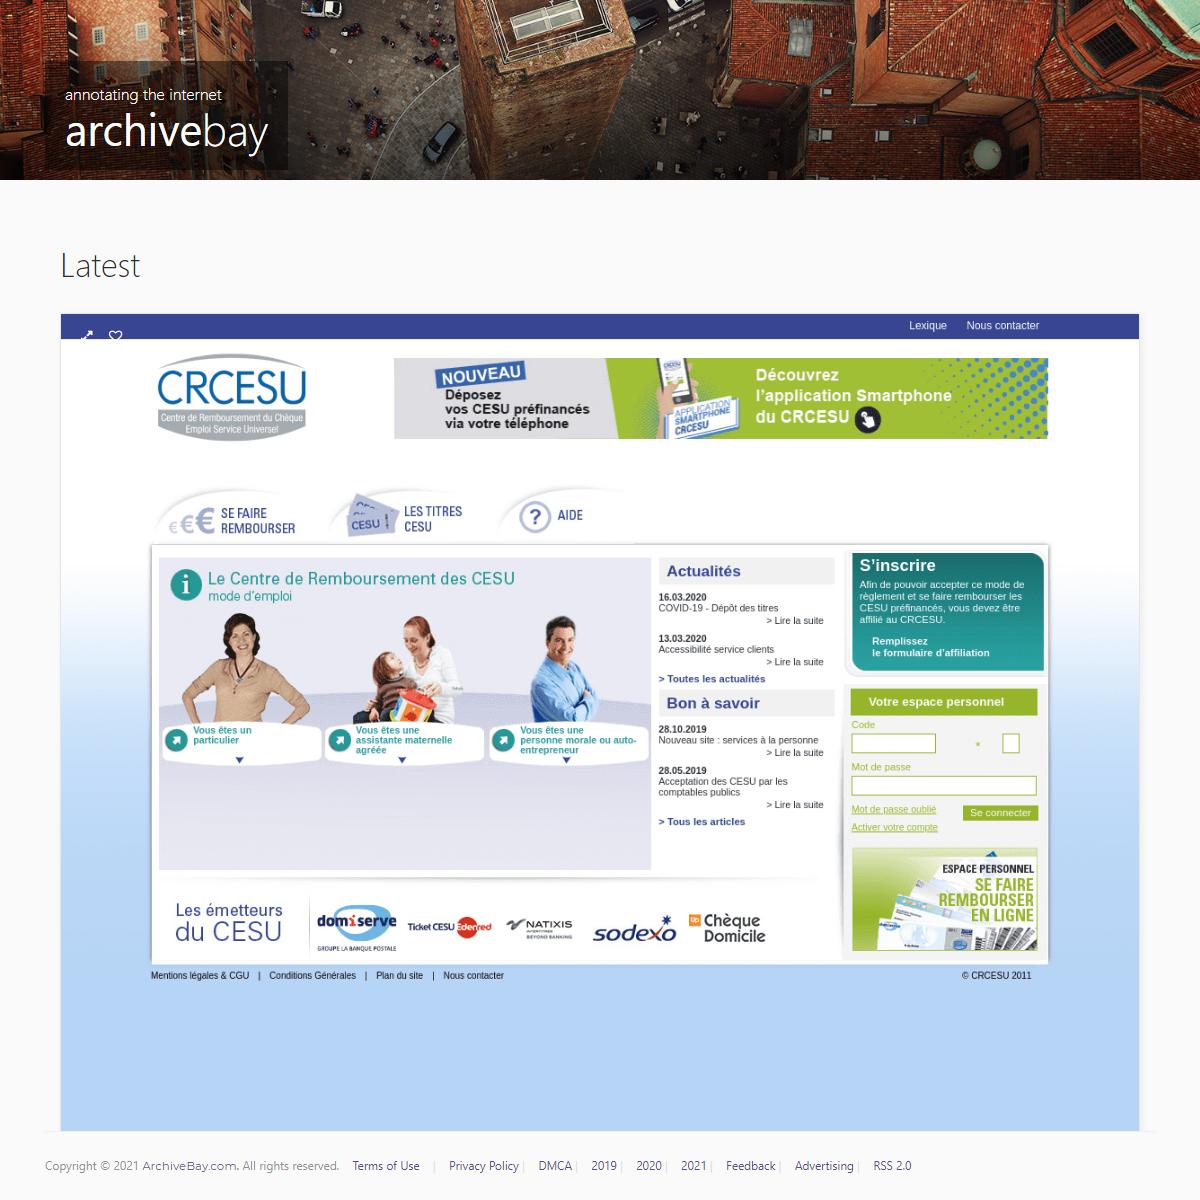 CRCESU centre de remboursement du CESU